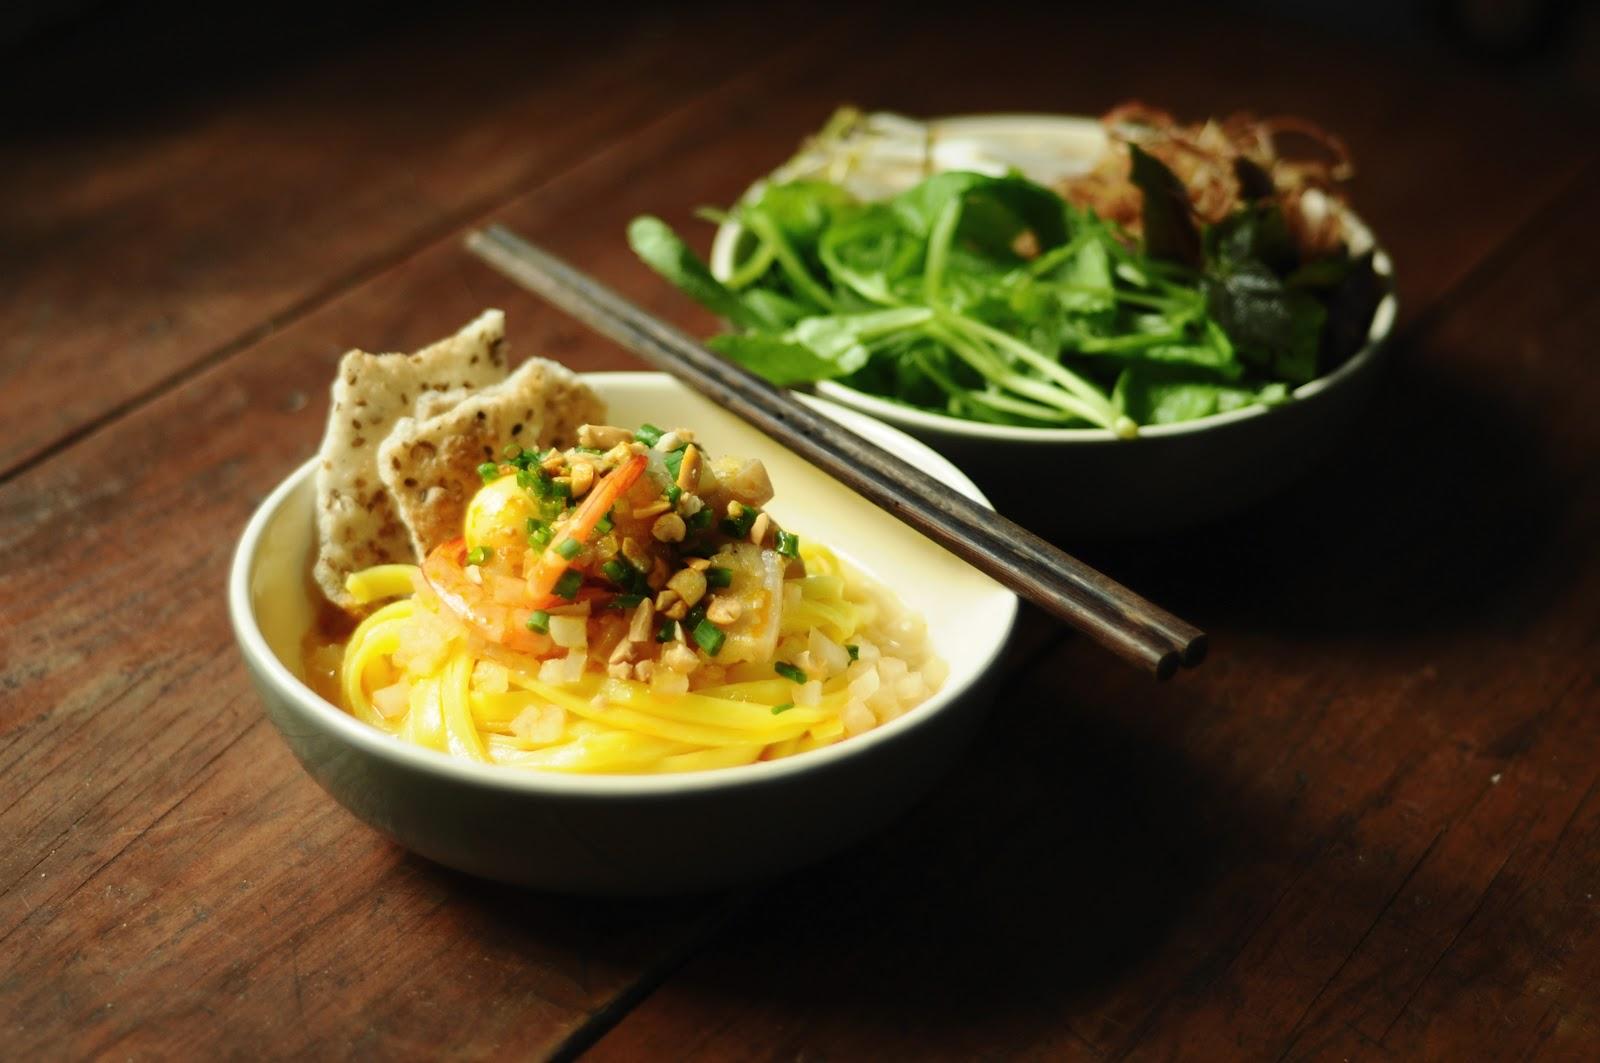 Mi Quang - Quang Noodles in Center of Vietnam